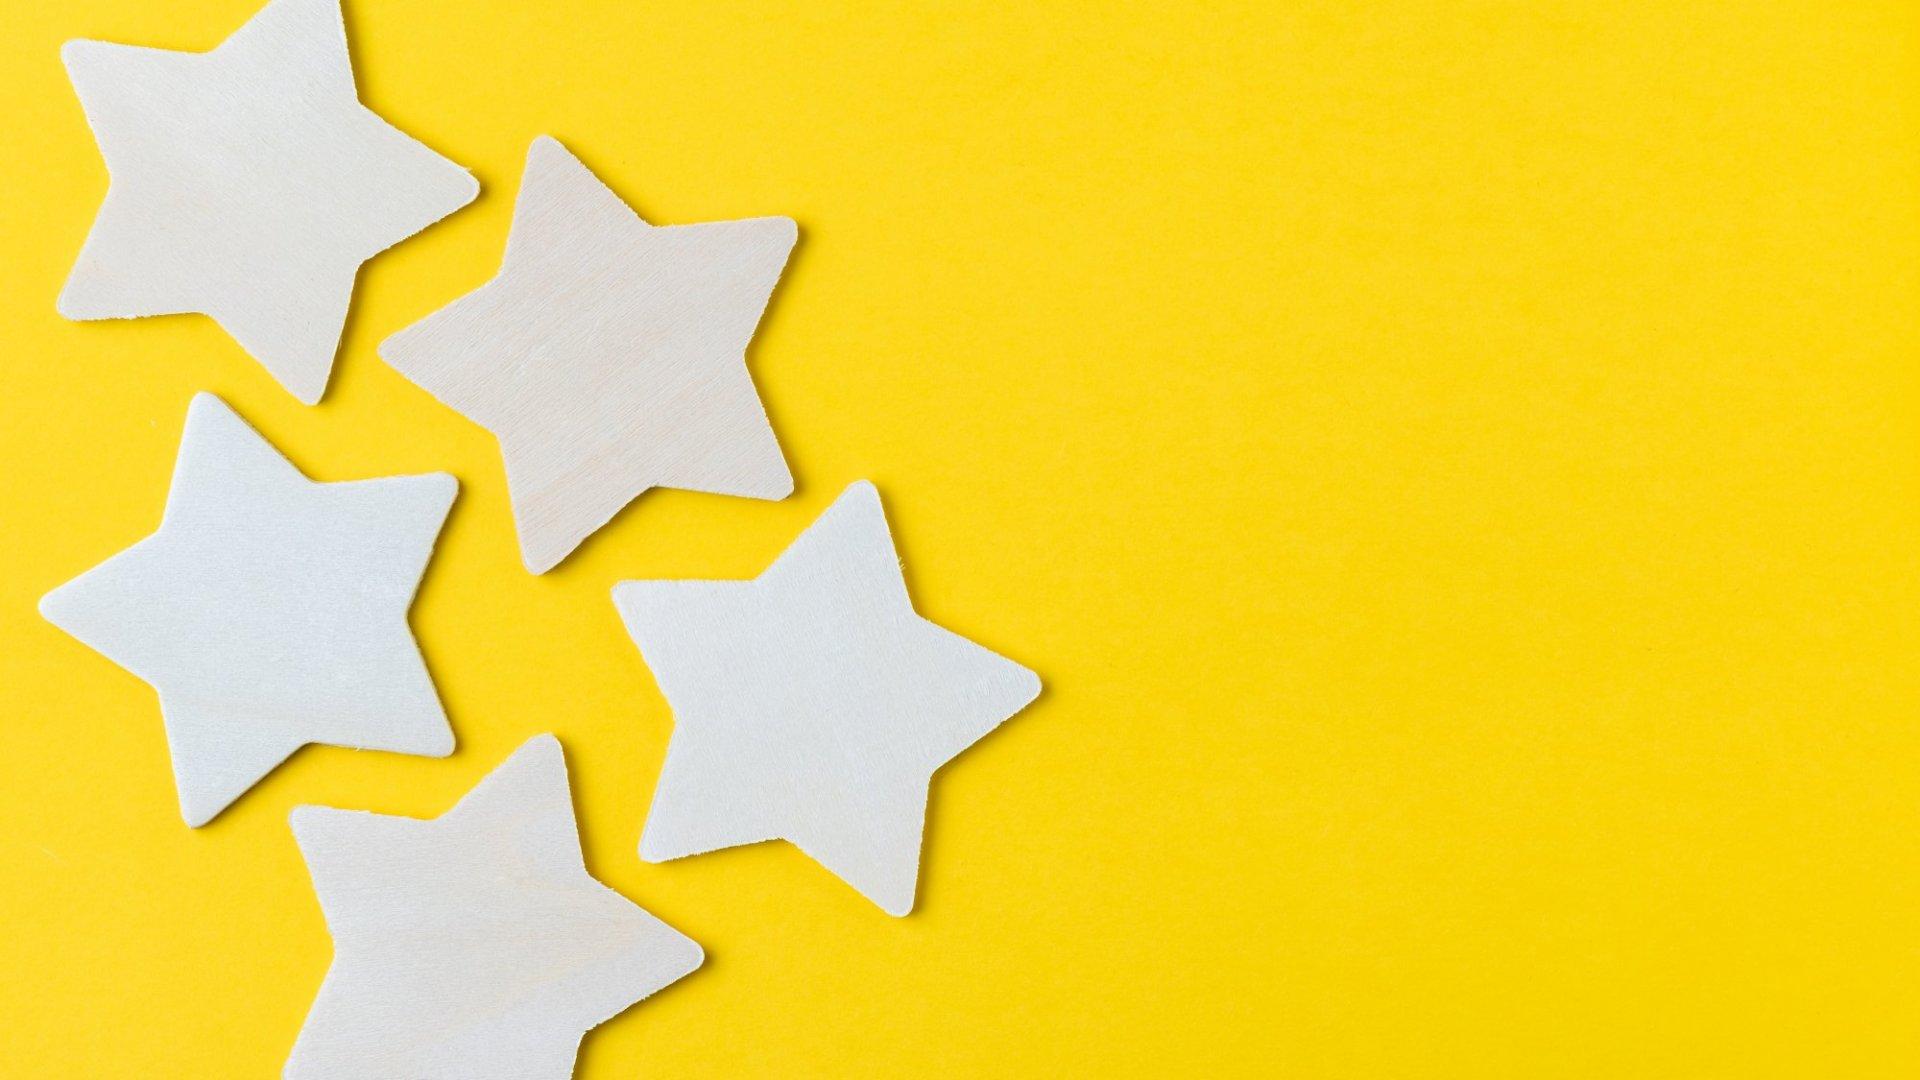 5 Non-Spammy Ways to Gain Positive Customer ReviewsOnline